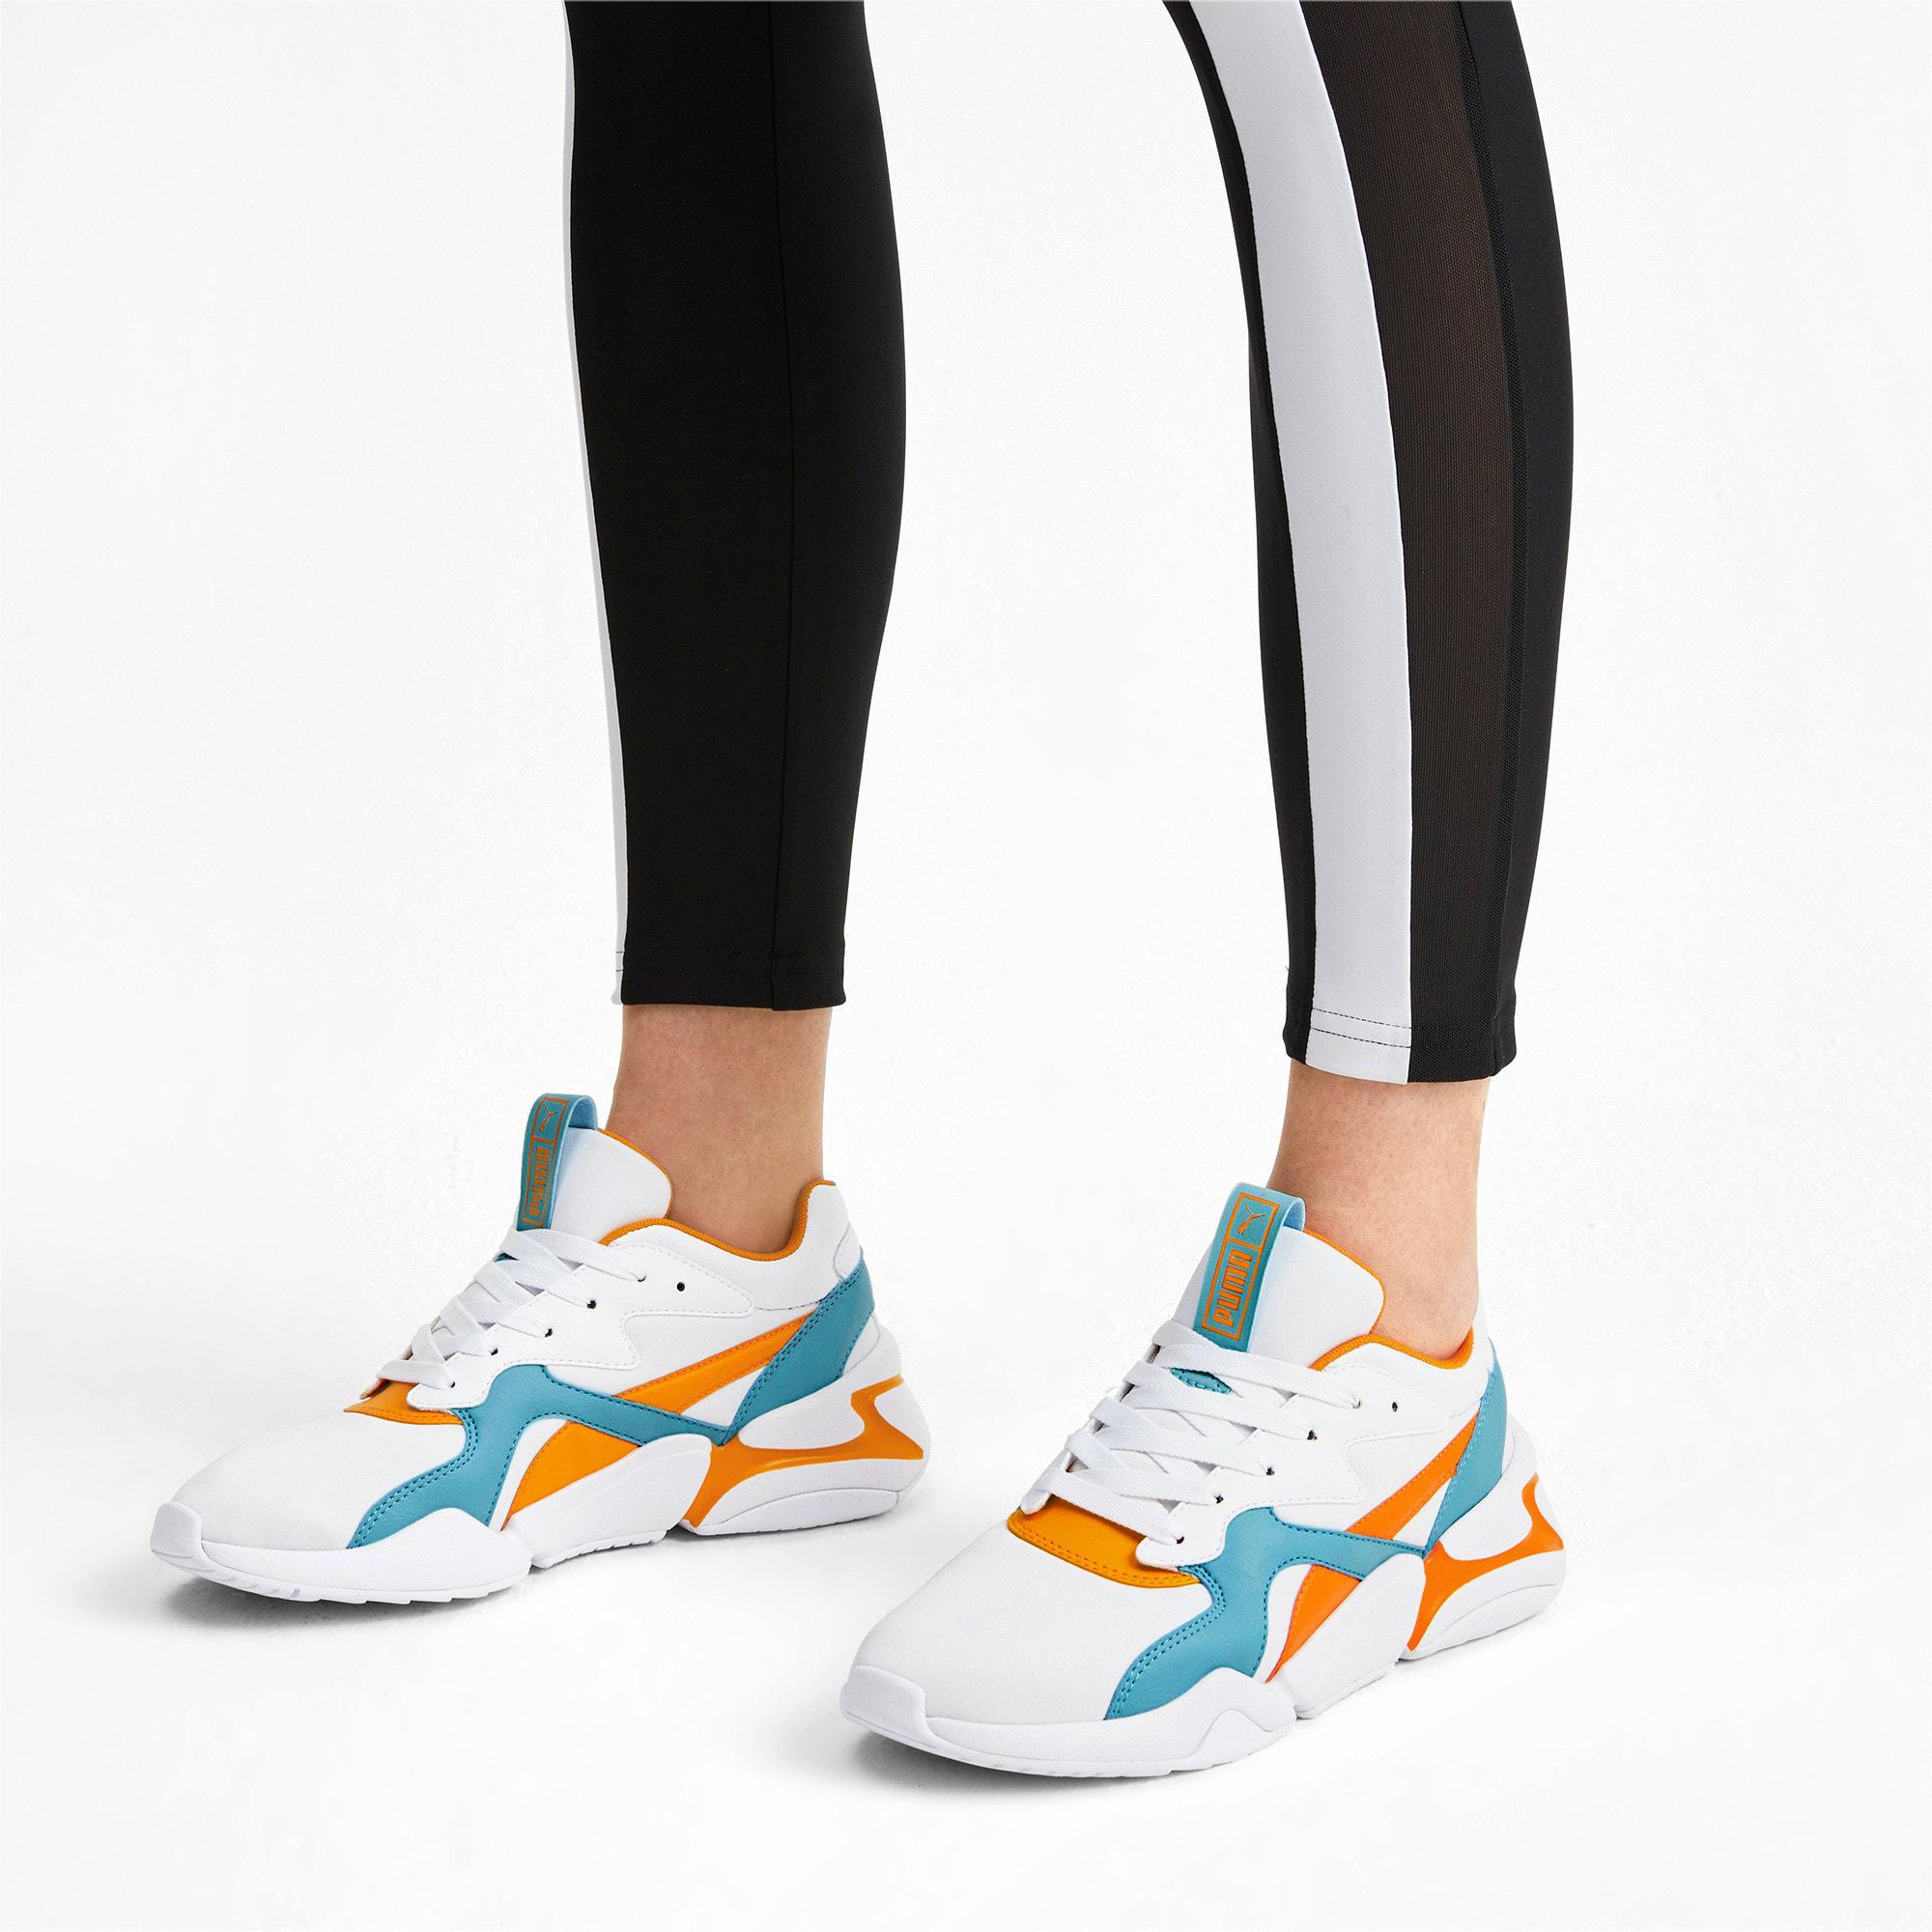 Thumbnail 2 of Nova Women's Sneakers, Puma White-Milky Blue, medium